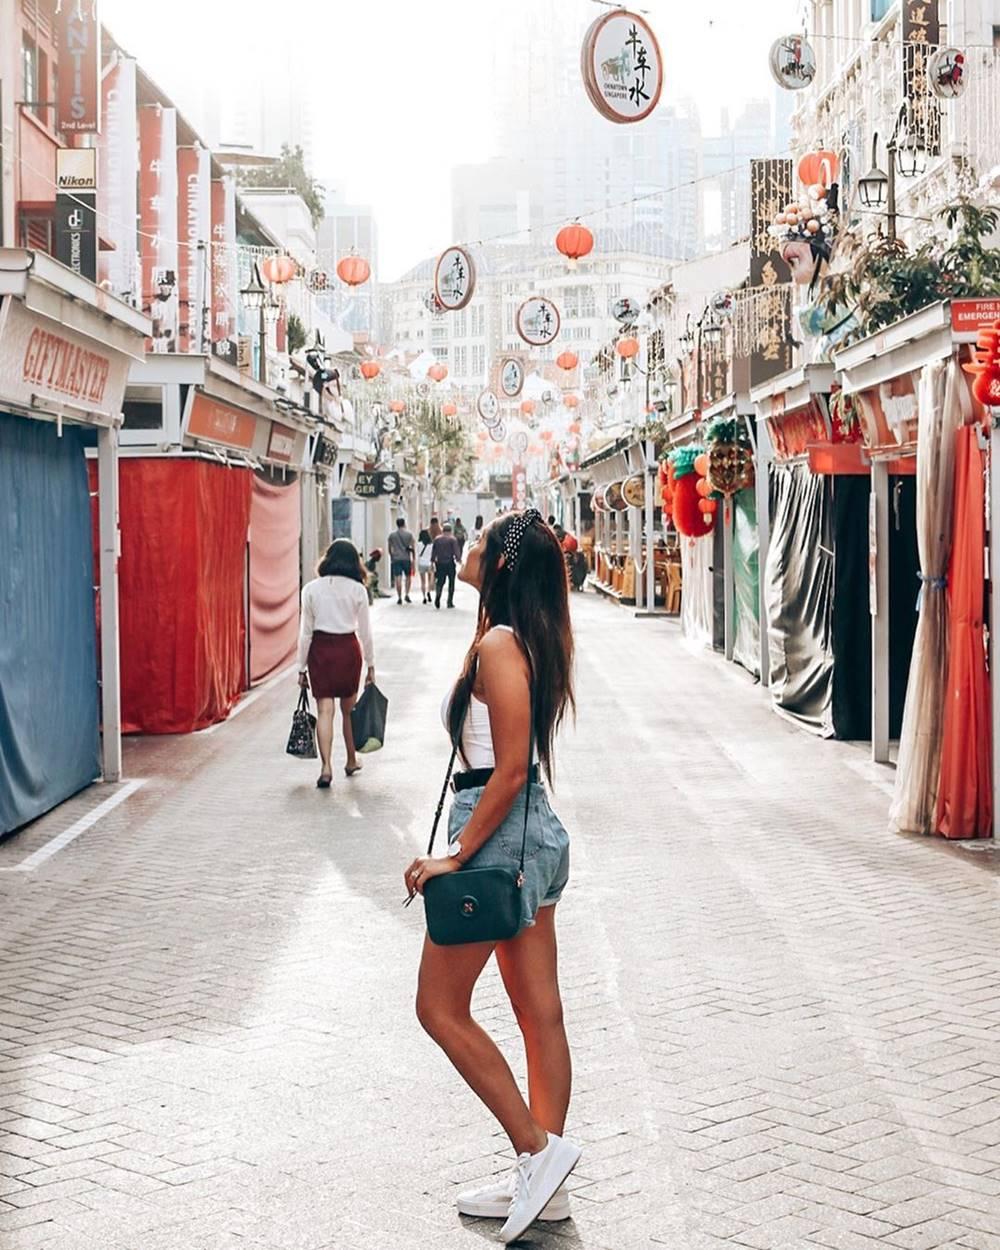 Chinatown Street Market Sebelum Buka. Instagram @bybrogen